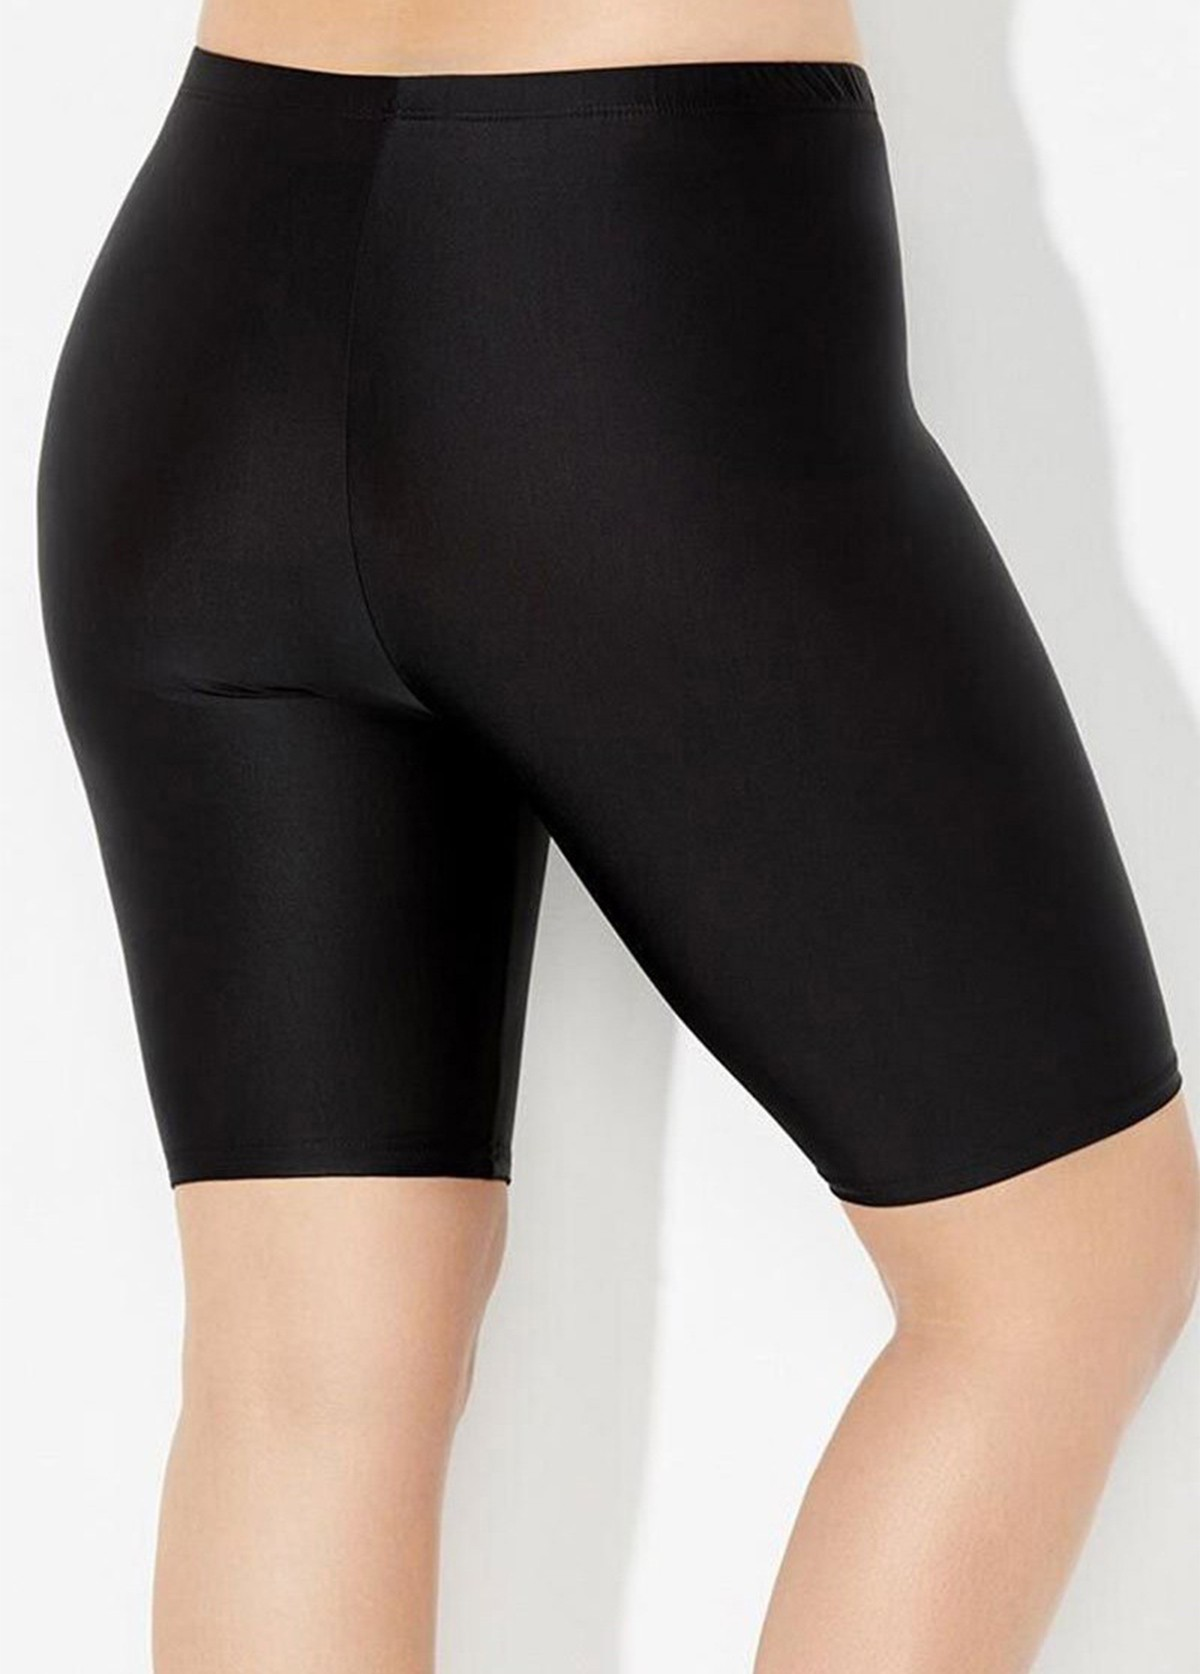 Solid Mid Waist Plus Size Swimwear Bottom